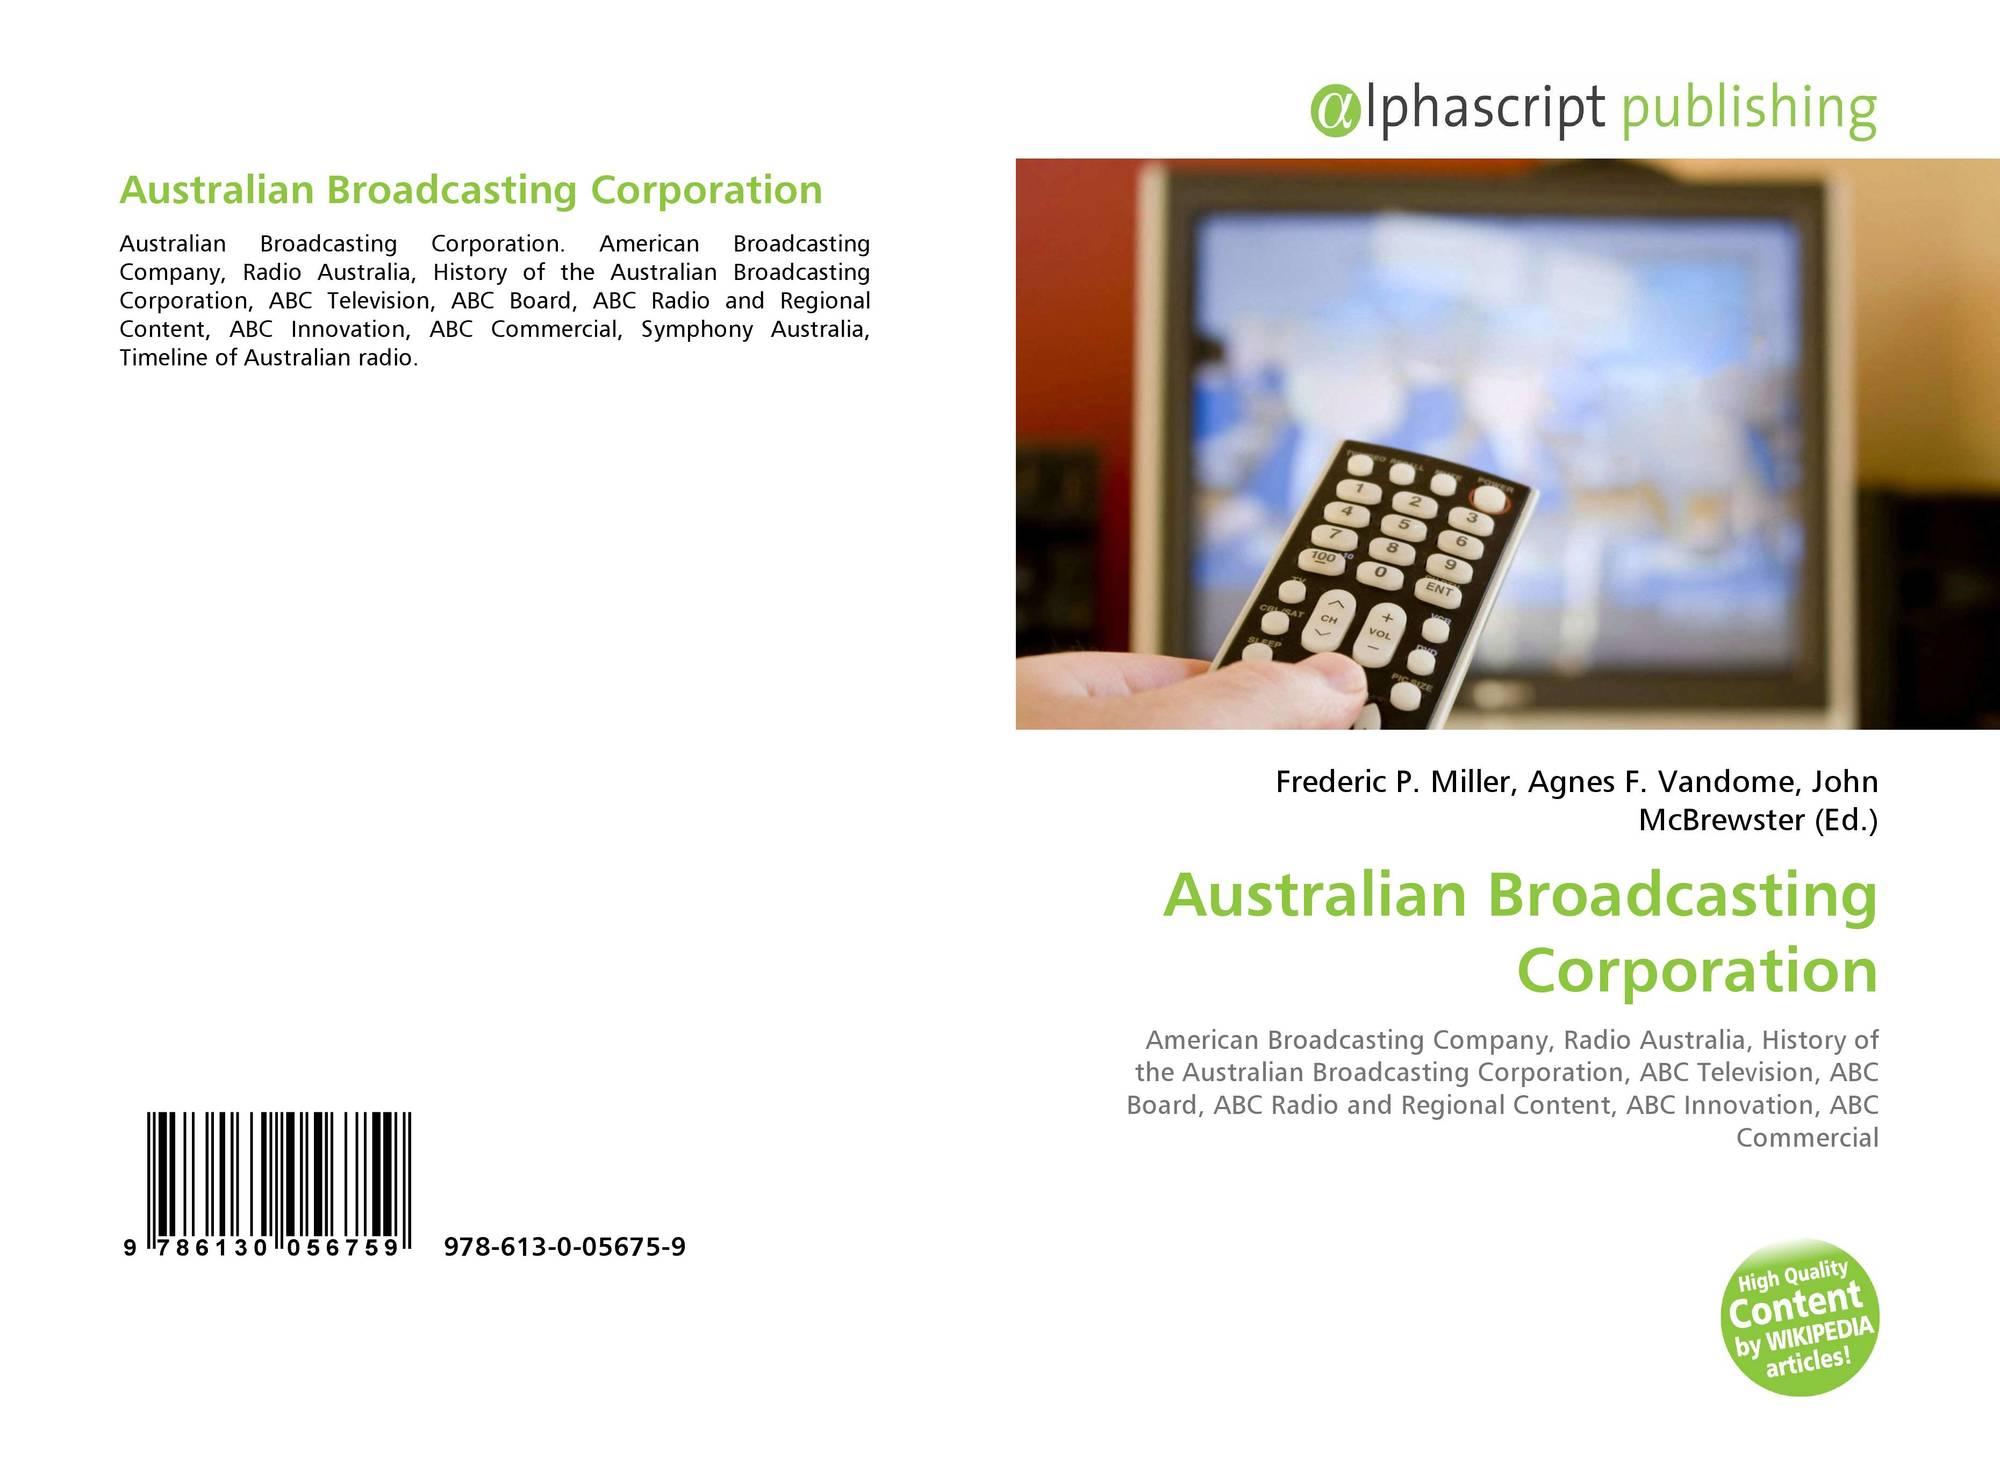 Australian Broadcasting Corporation, 978-613-0-05675-9, 6130056753